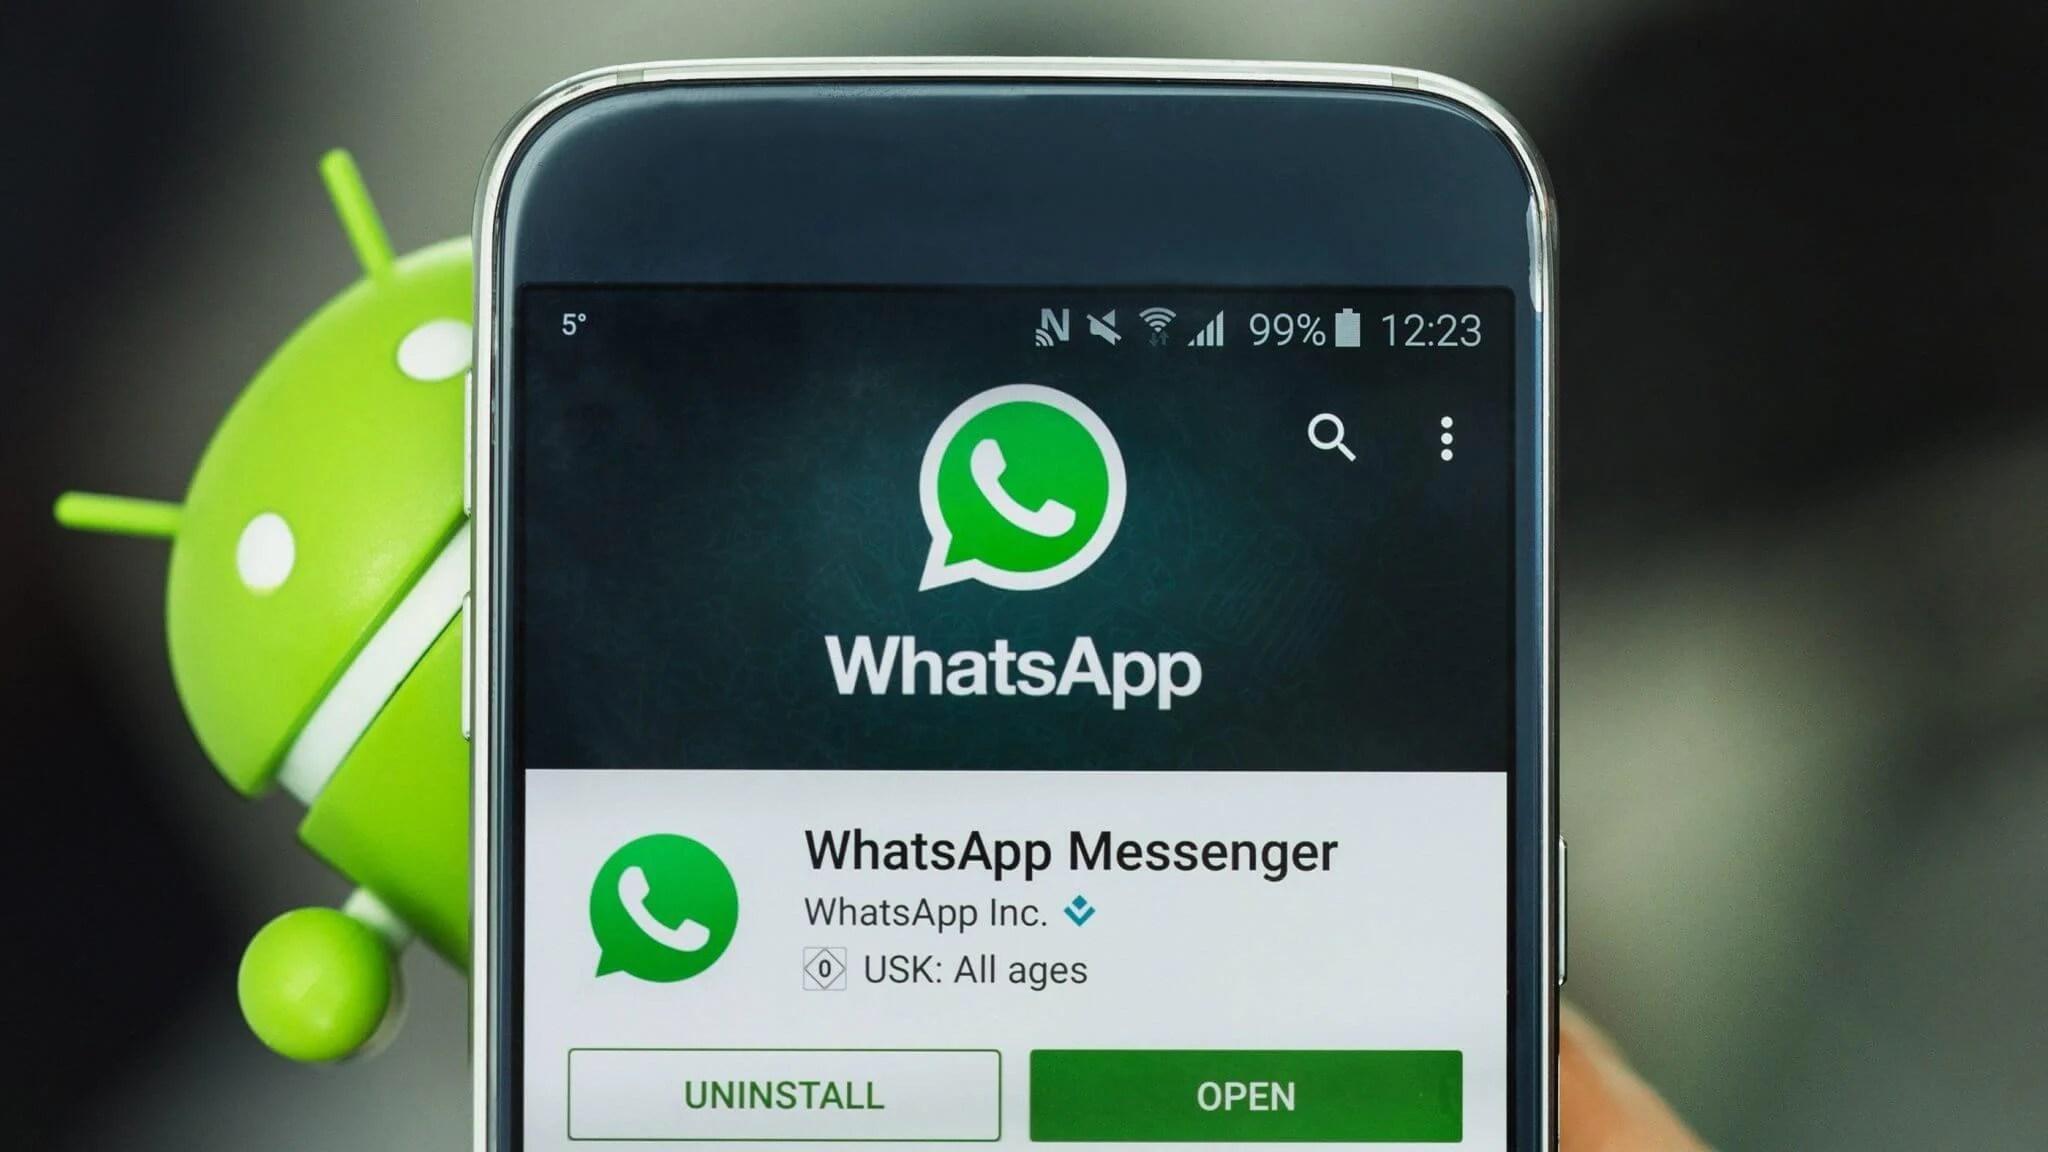 android duas contas whatsapp - Tutorial: como configurar duas contas do Whatsapp no Android